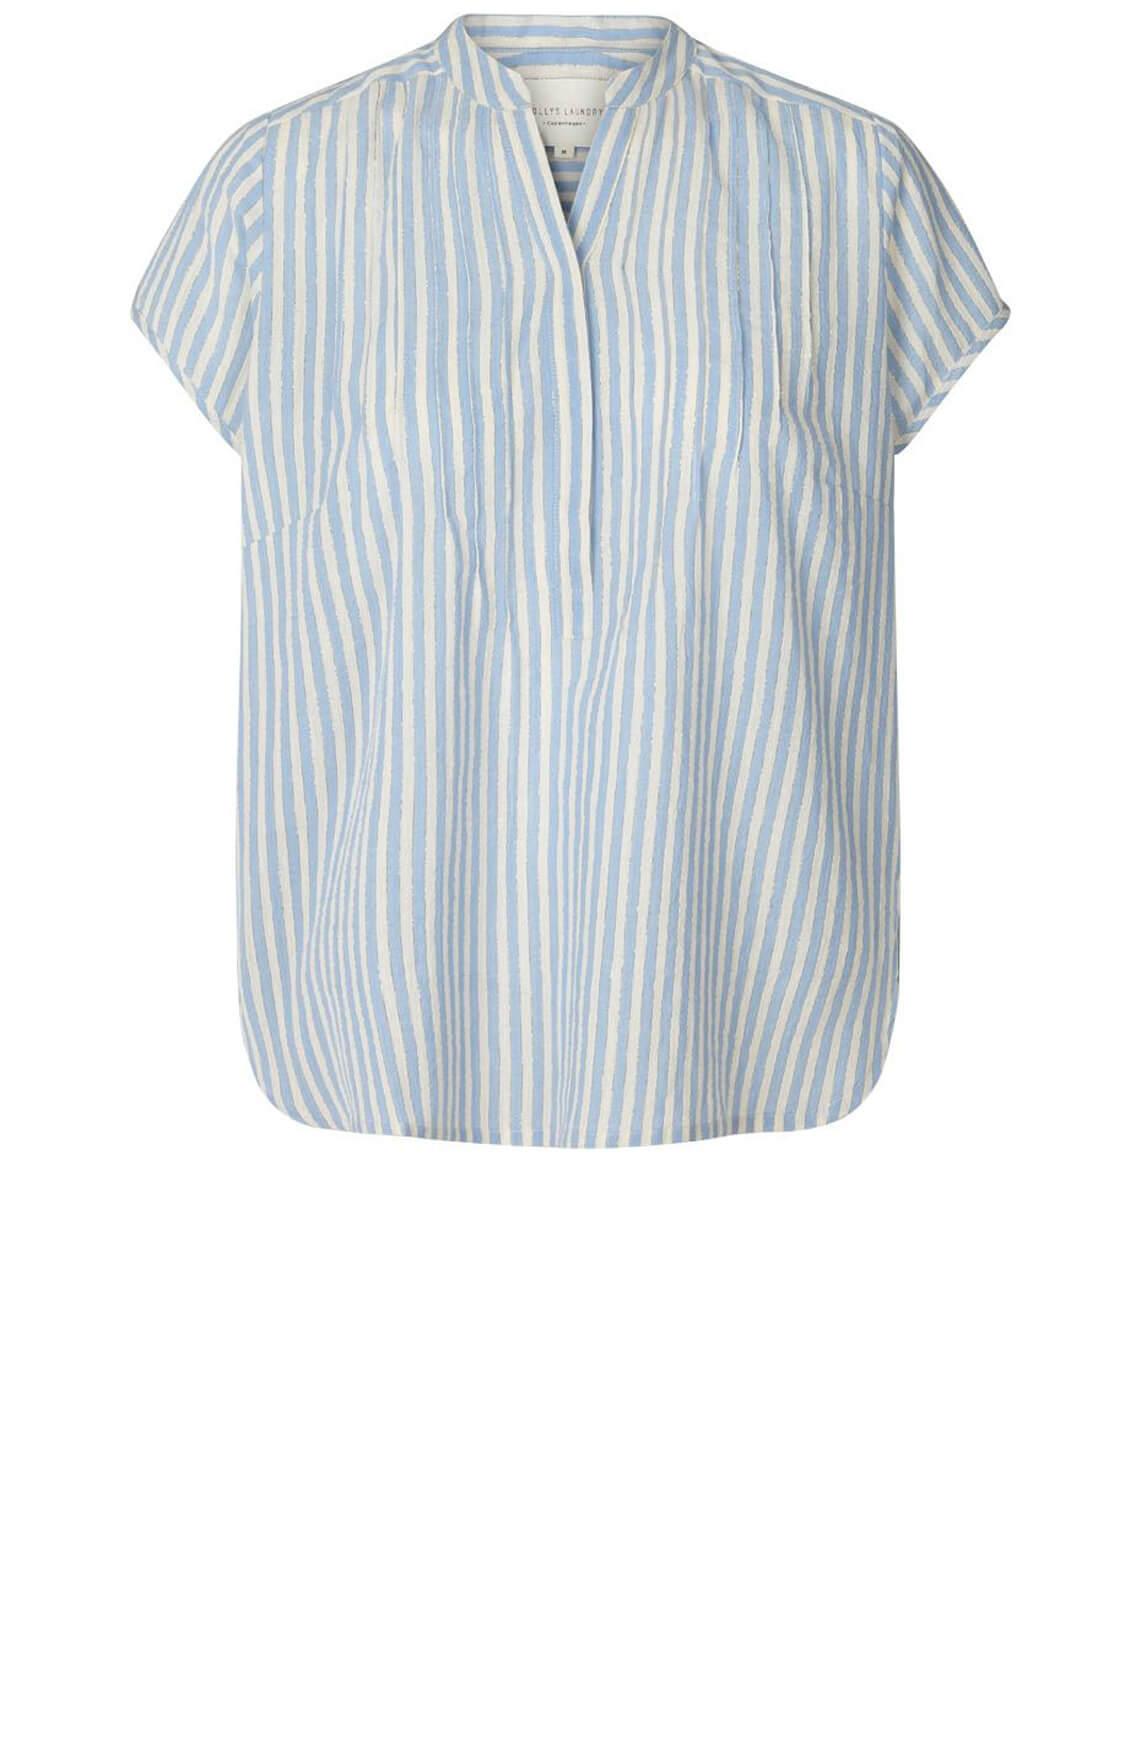 Lollys Laundry Dames Heather gestreepte blouse Blauw